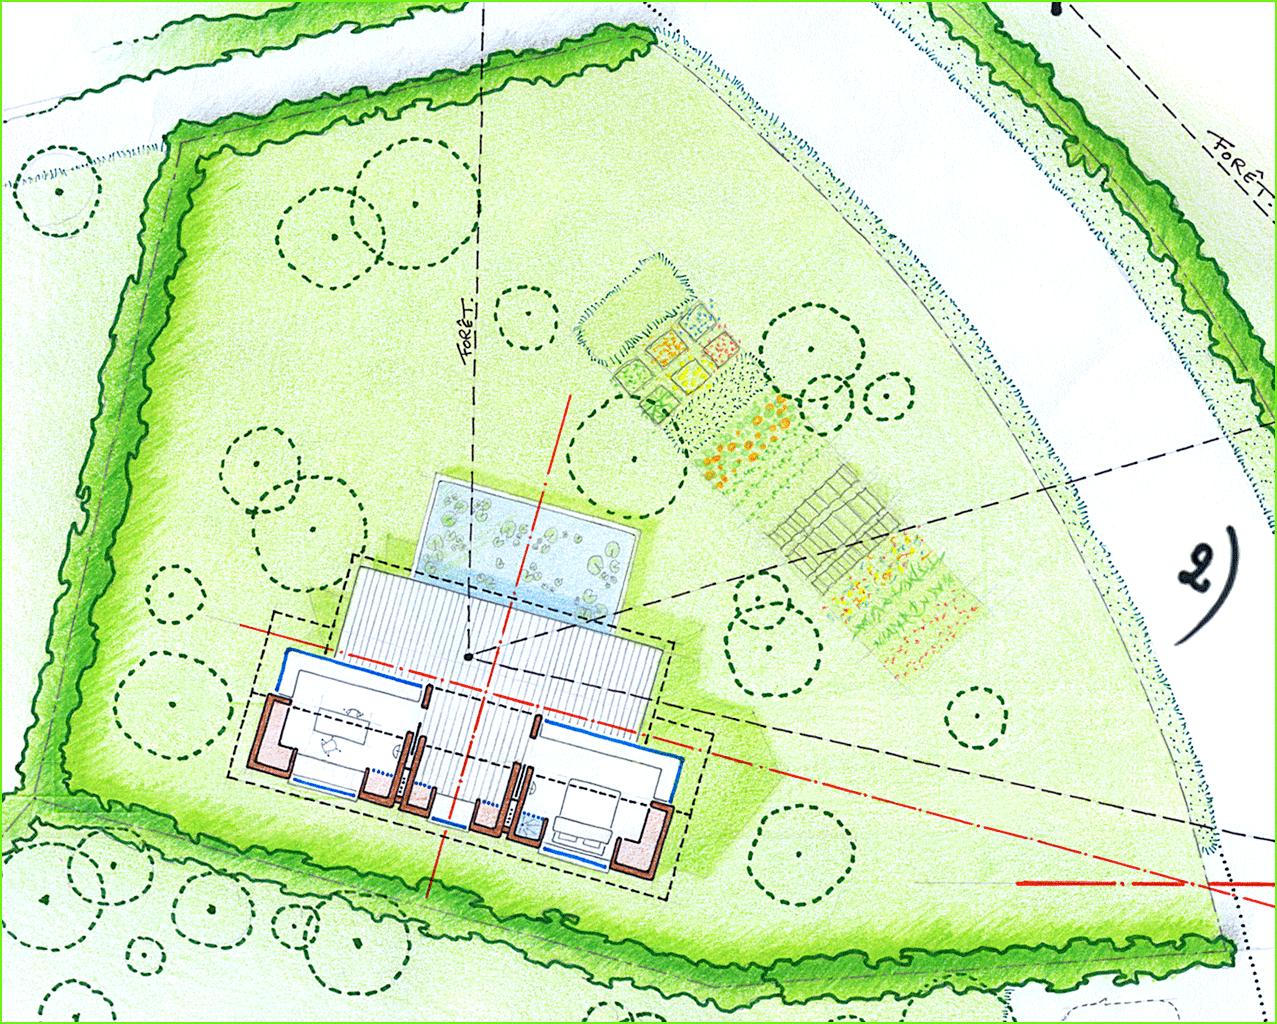 LePrat-Plan-zoom002.png